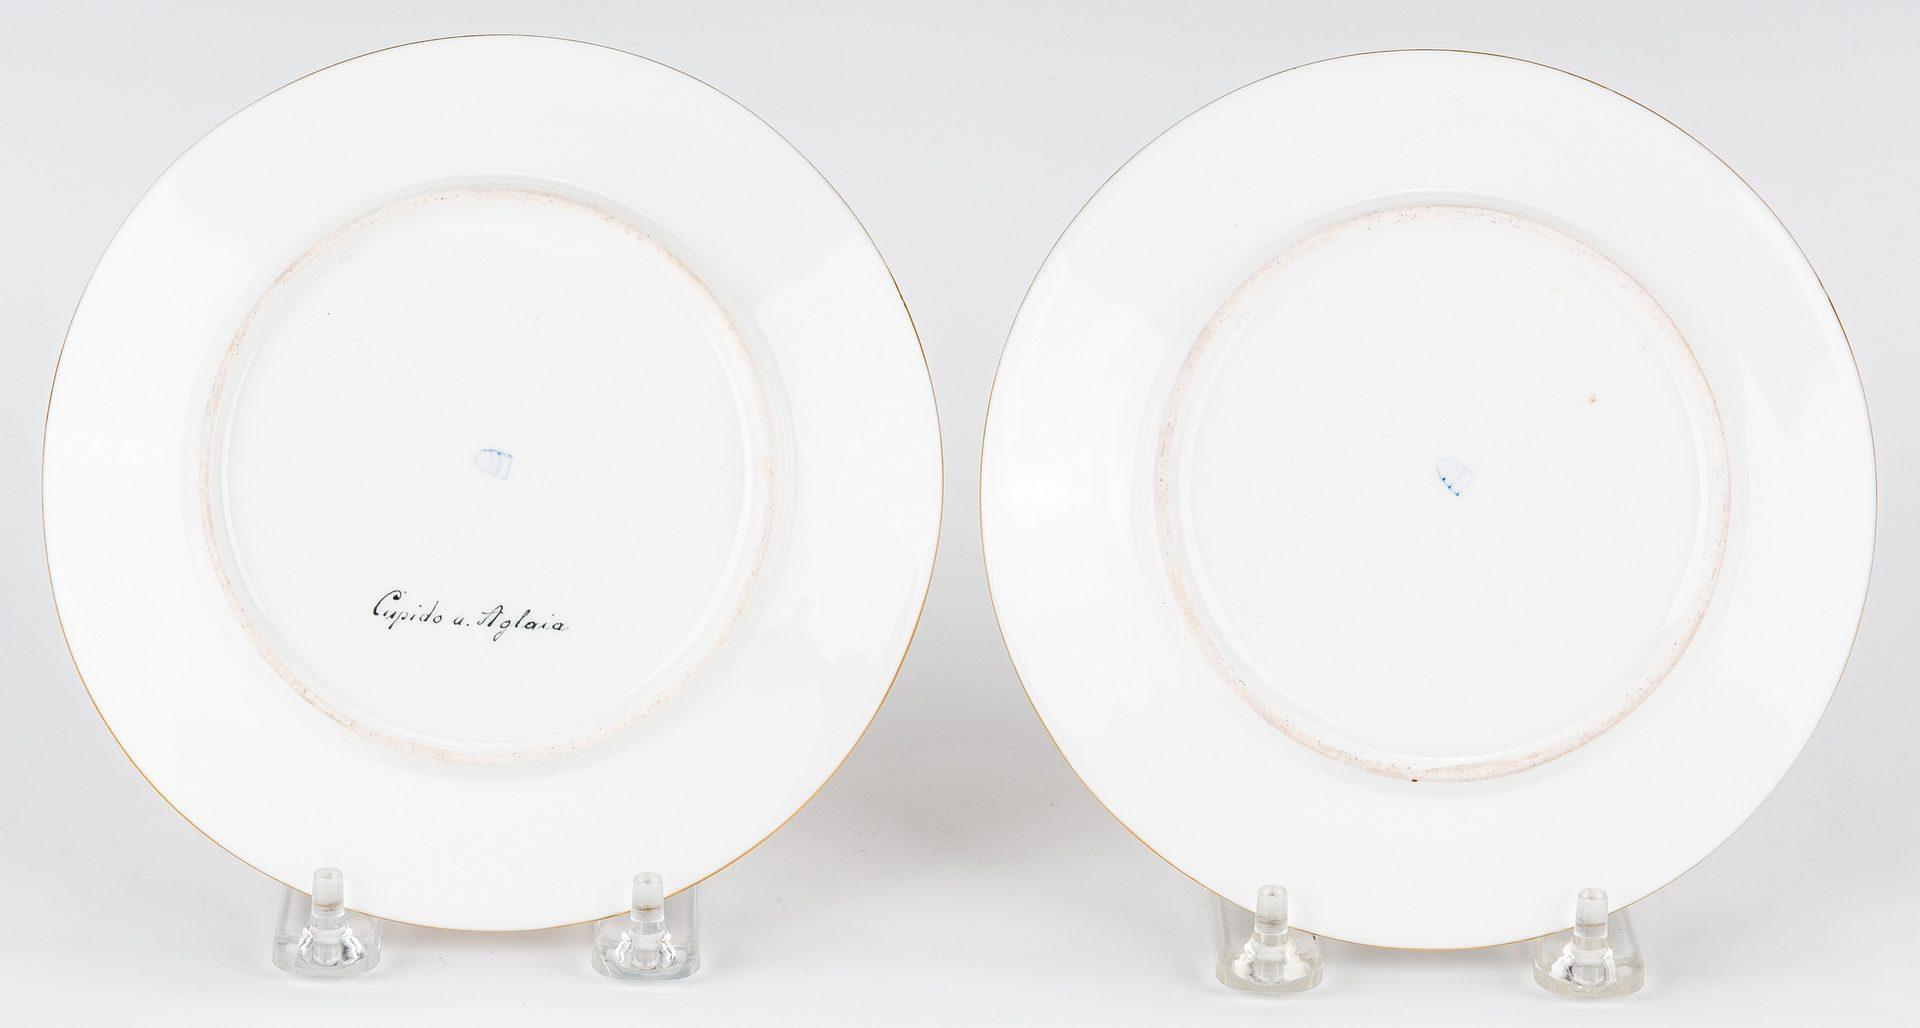 Lot 227: Pr. Royal Vienna Cabinet Plates, signed Bauer